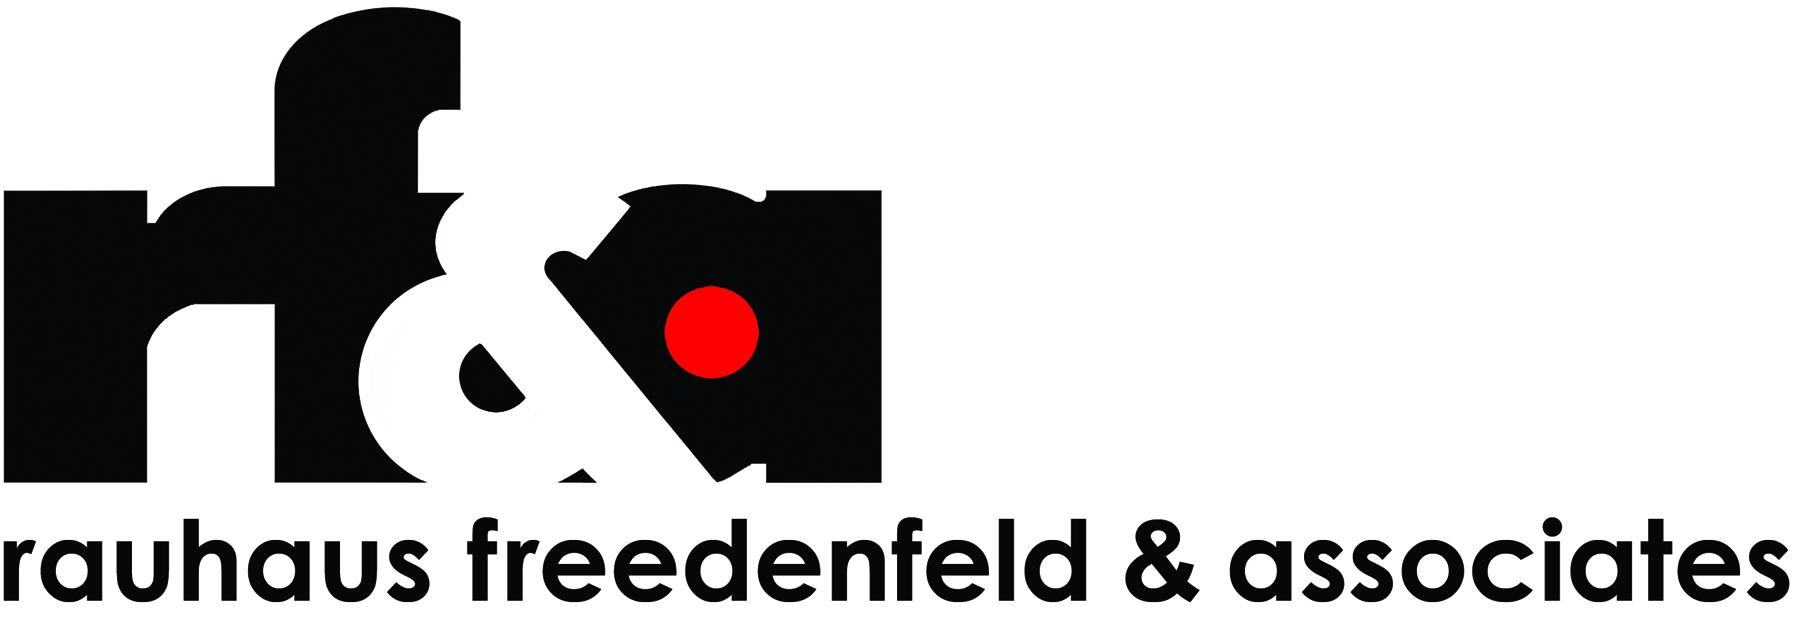 High res rfa logo